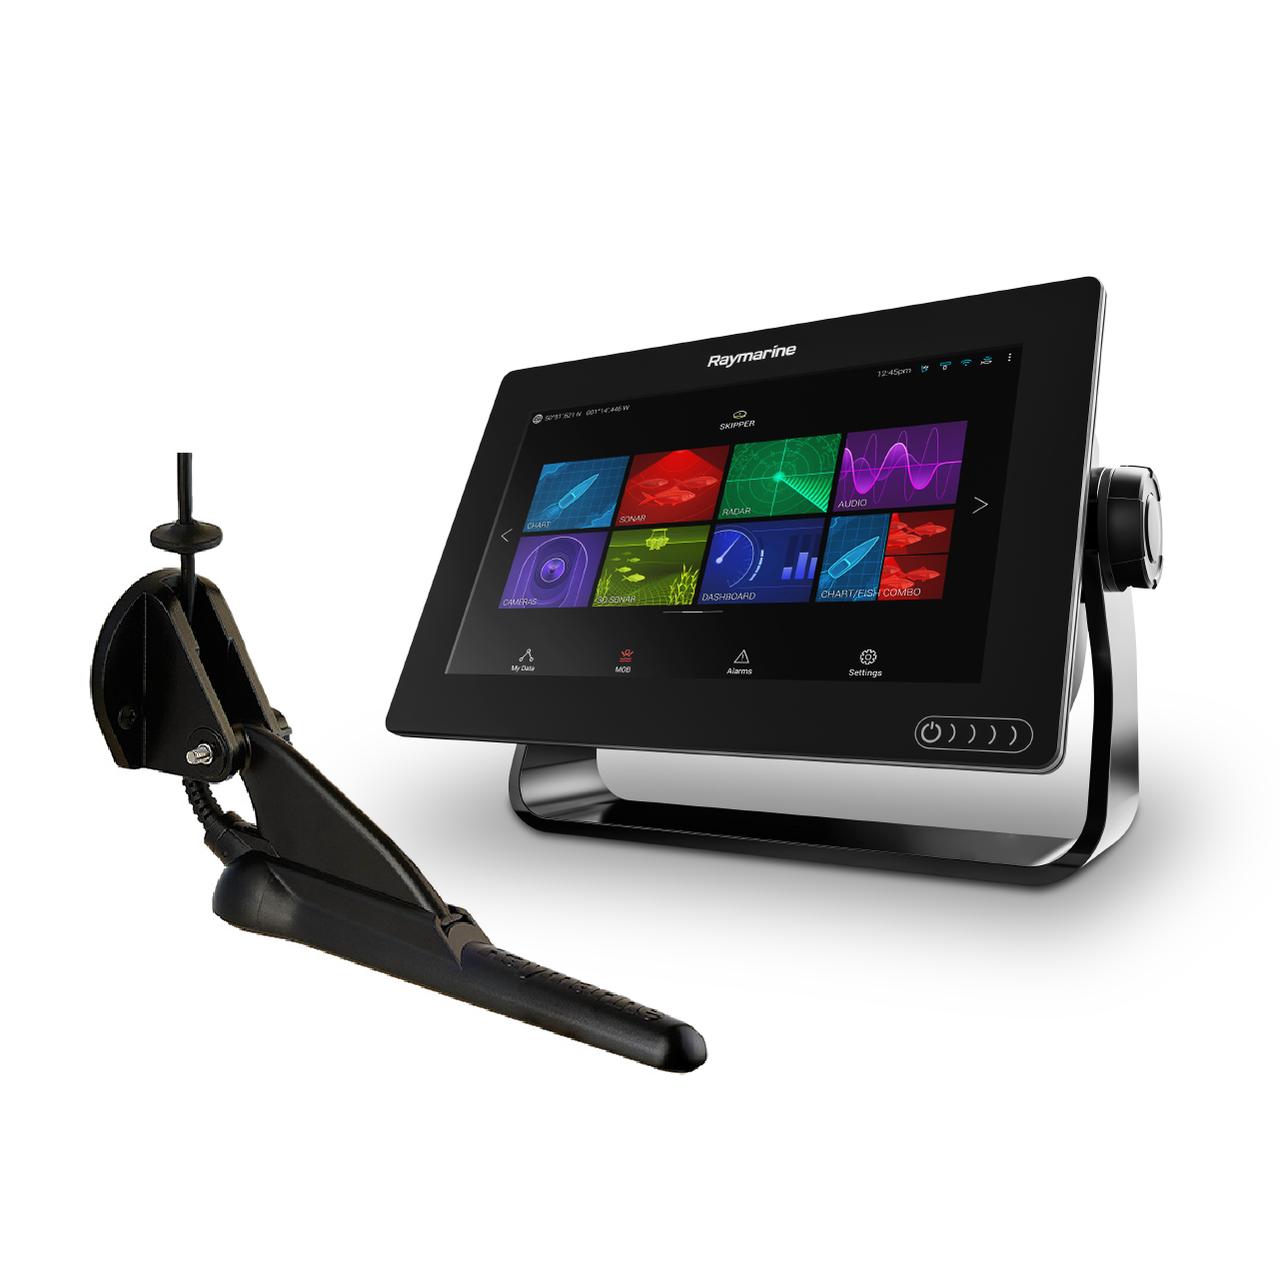 Raymarine Axiom 9 with RealVision 3D & CPT-100DVS Transducer